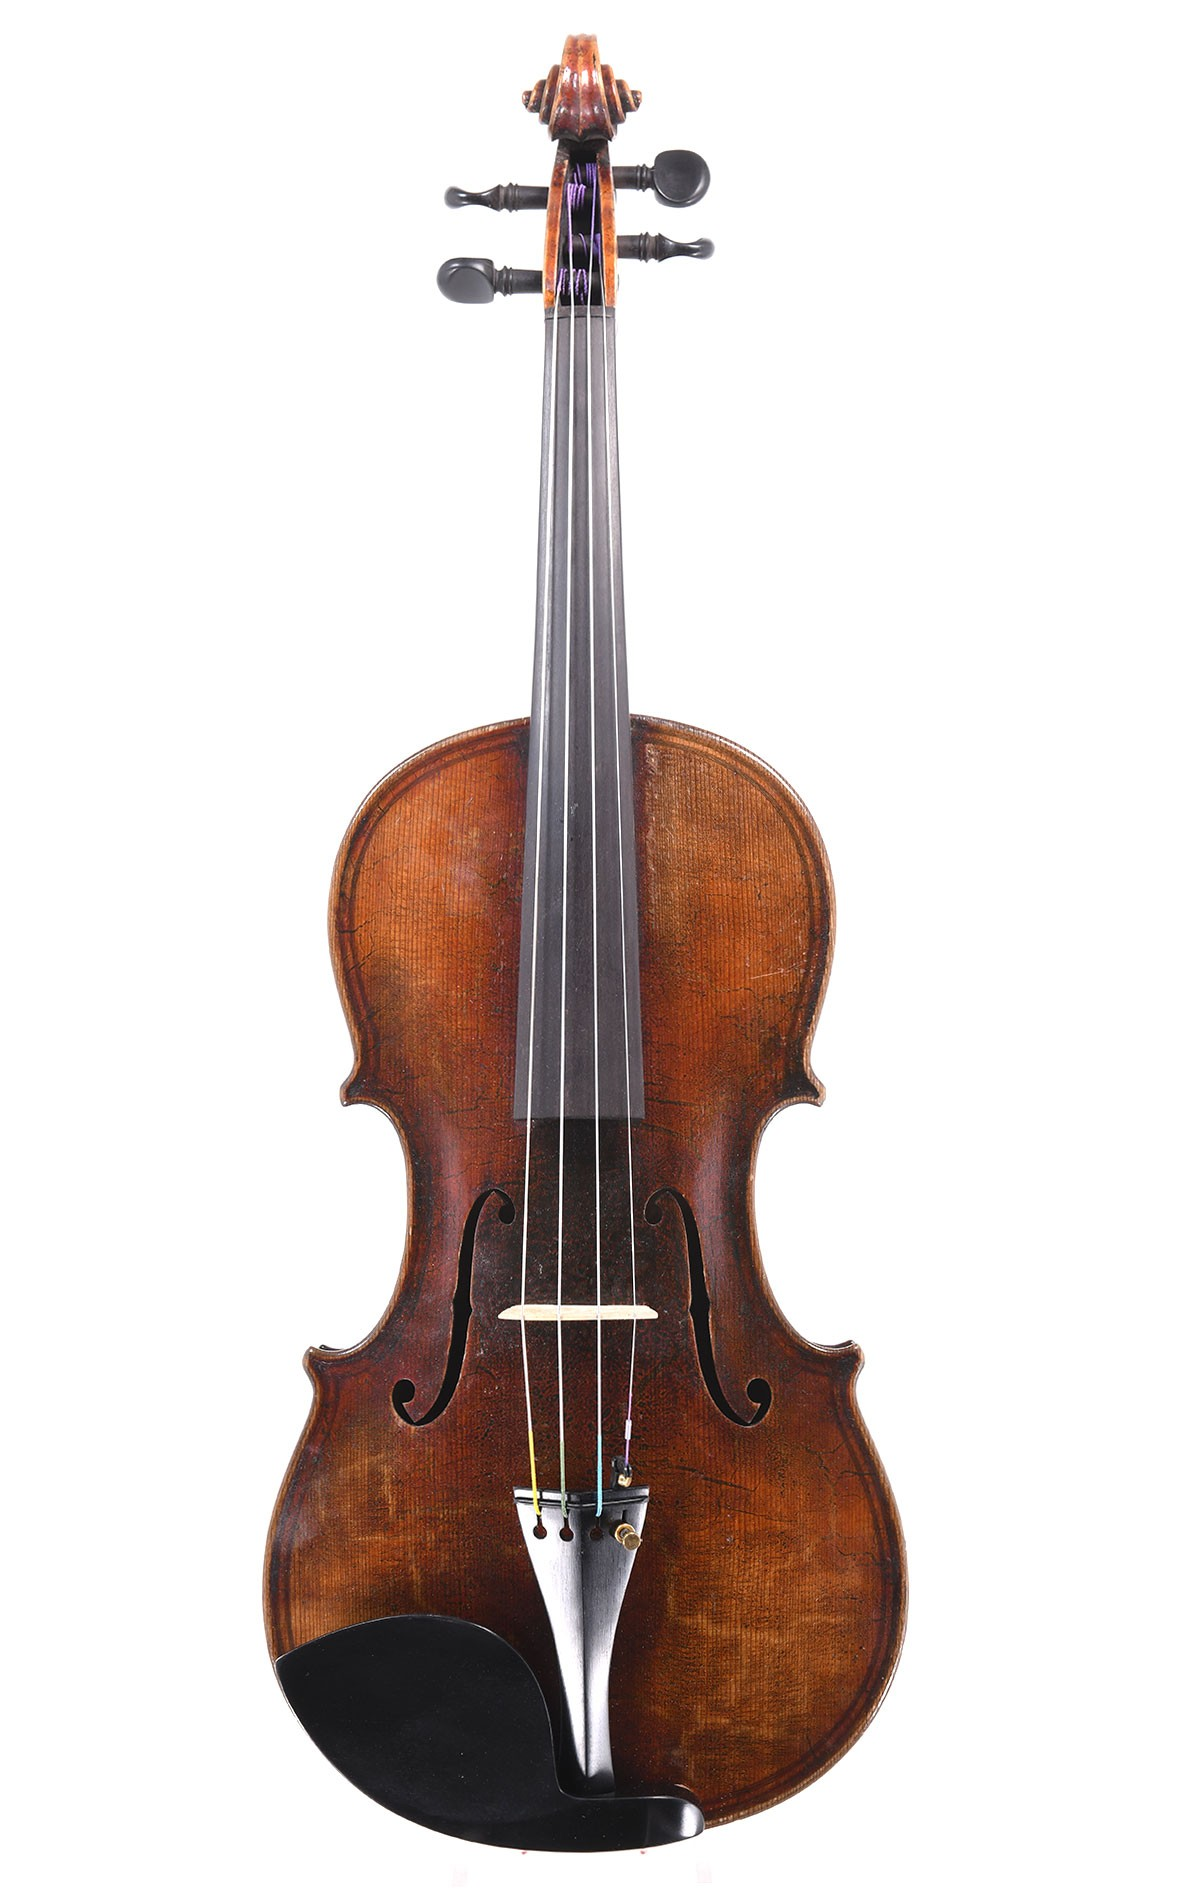 Maggini violin made in Markneukirchen